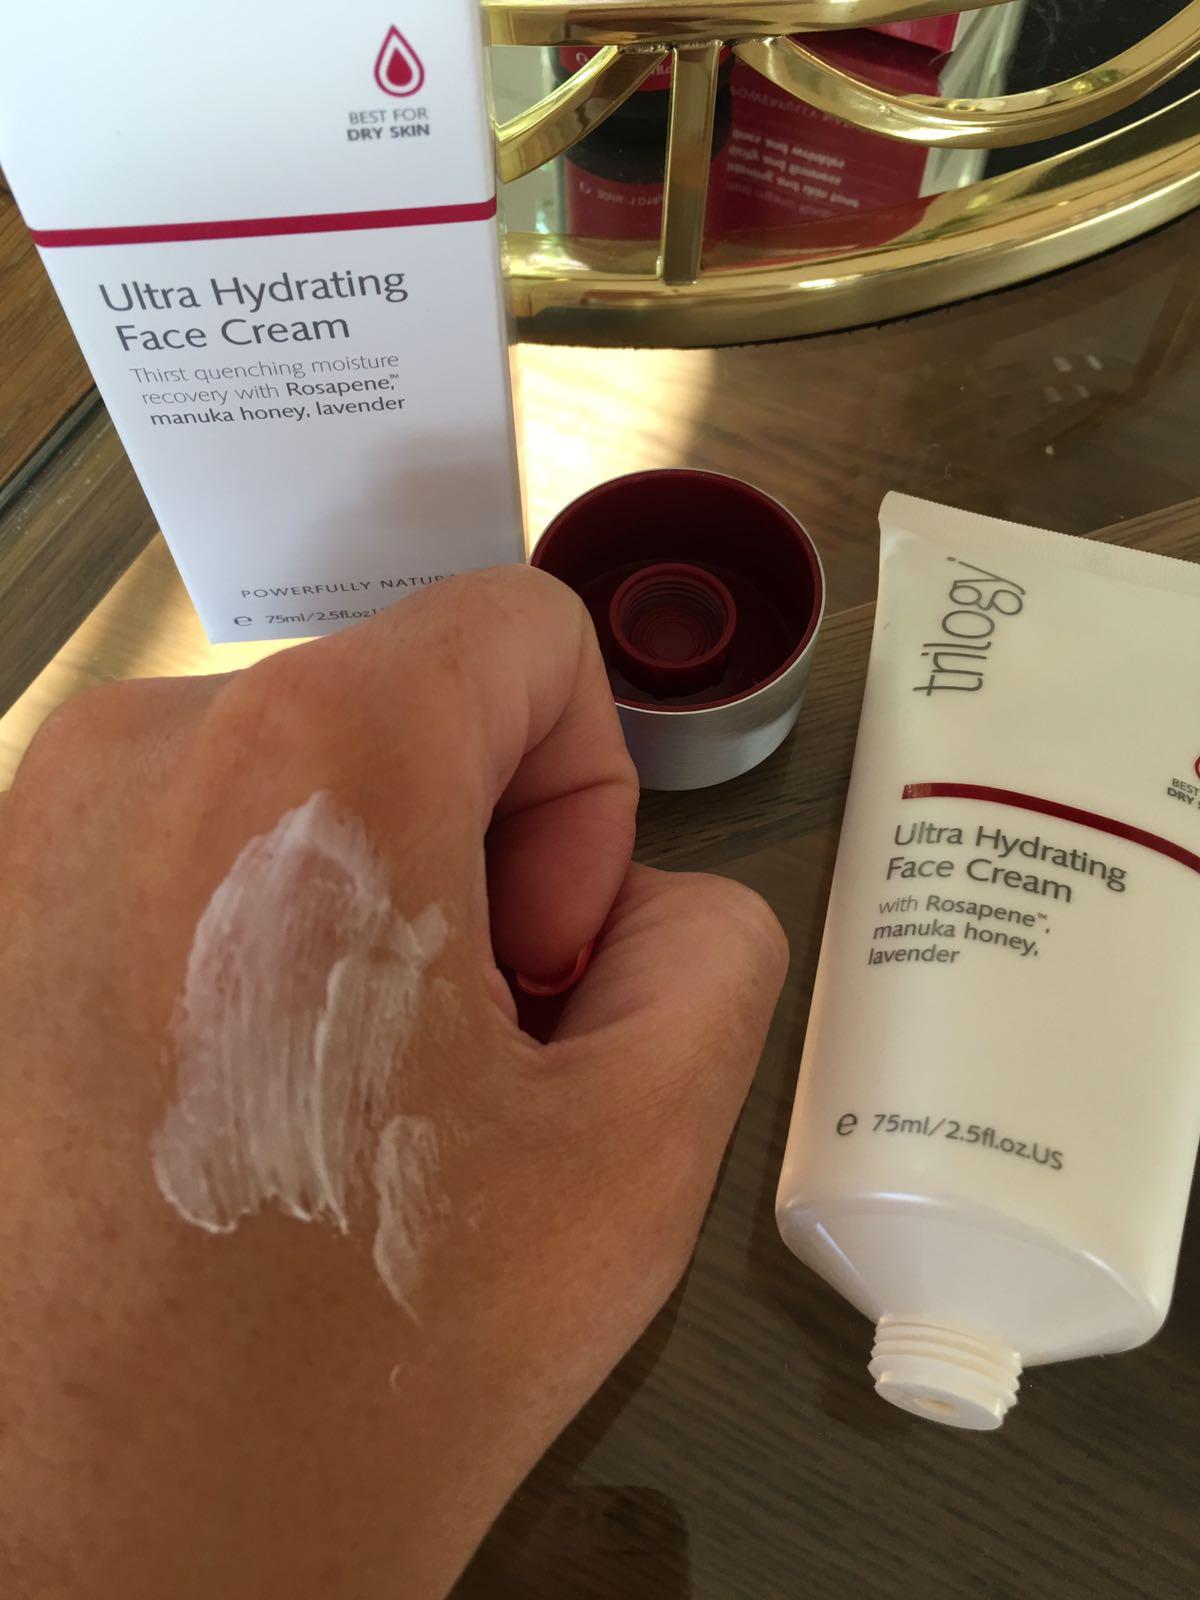 Trilogy Rosehip Oil Antioxidant+ & Ultra Hydrating Face